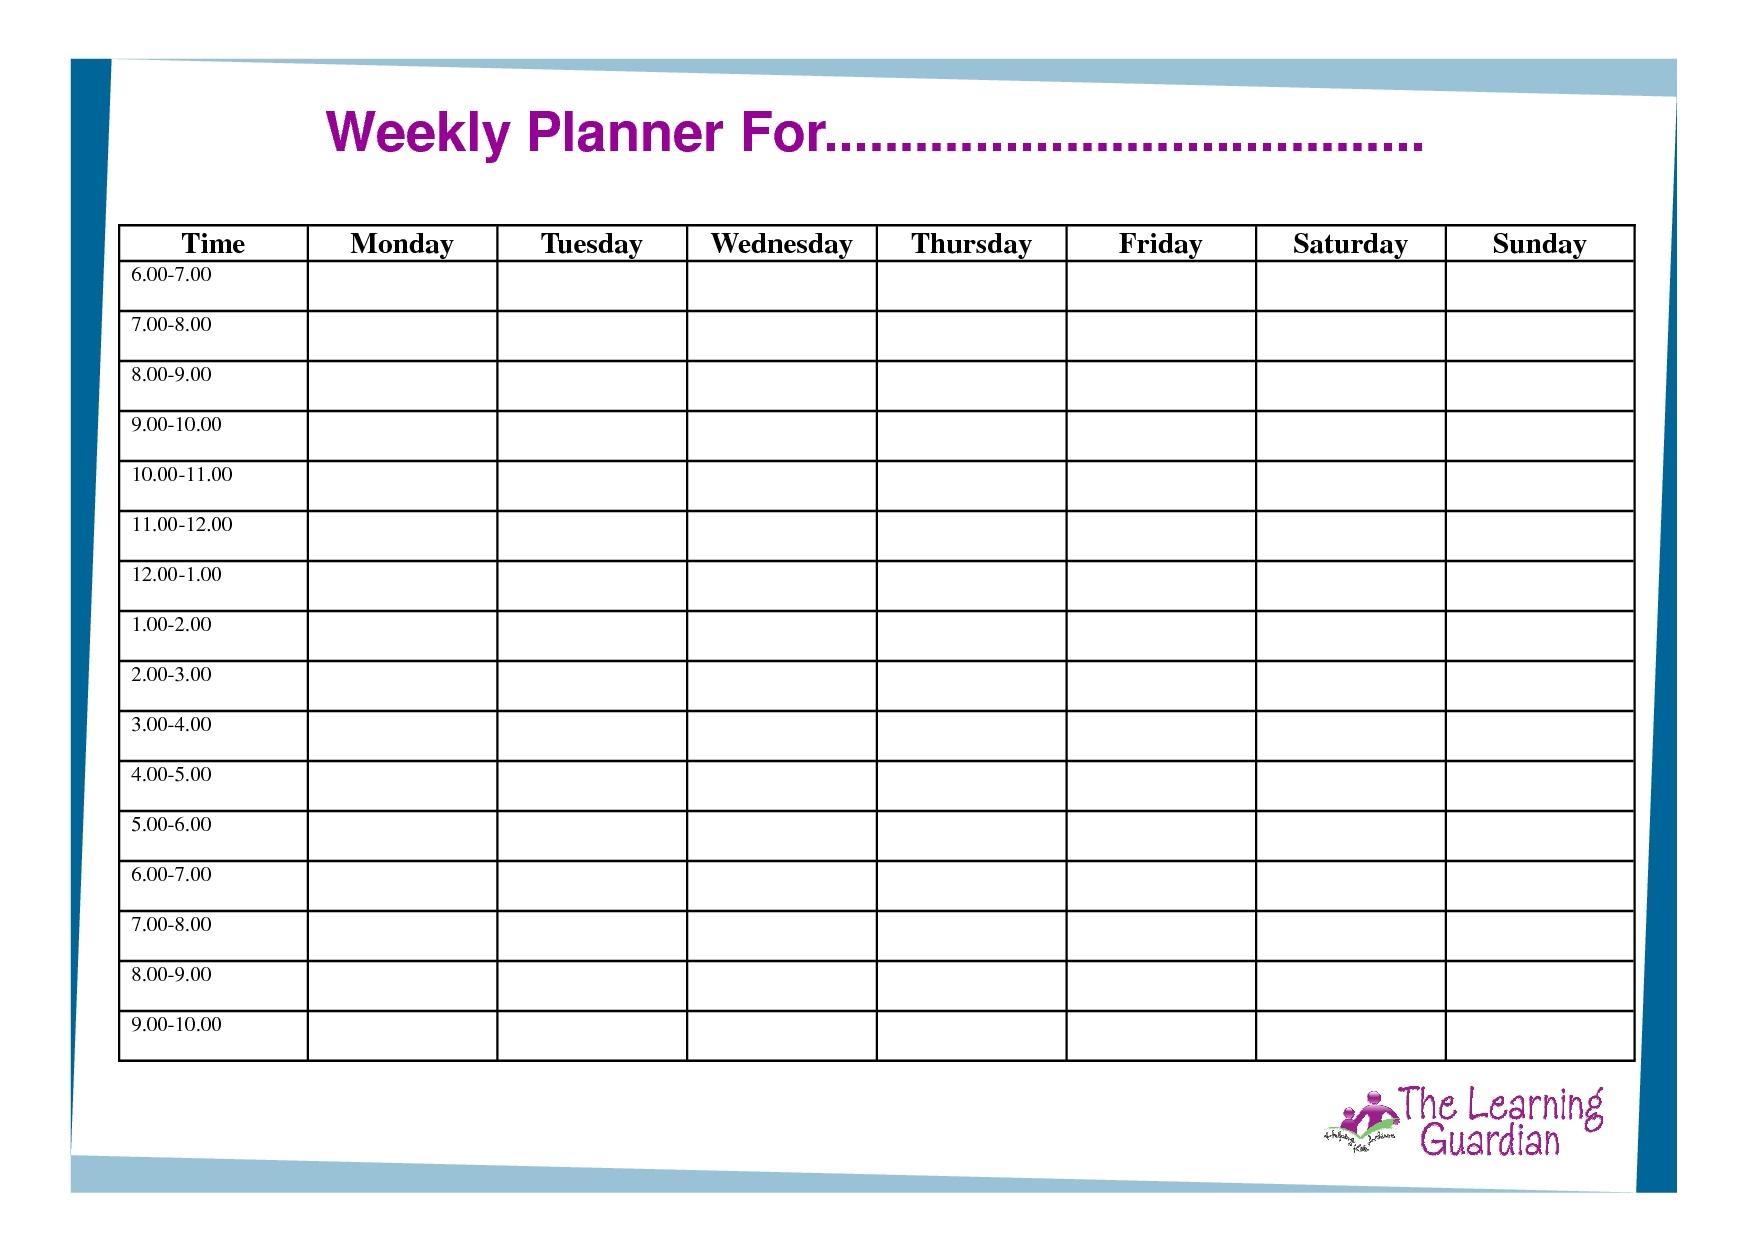 Weekly Schedule Monday Through Friday - Calendar